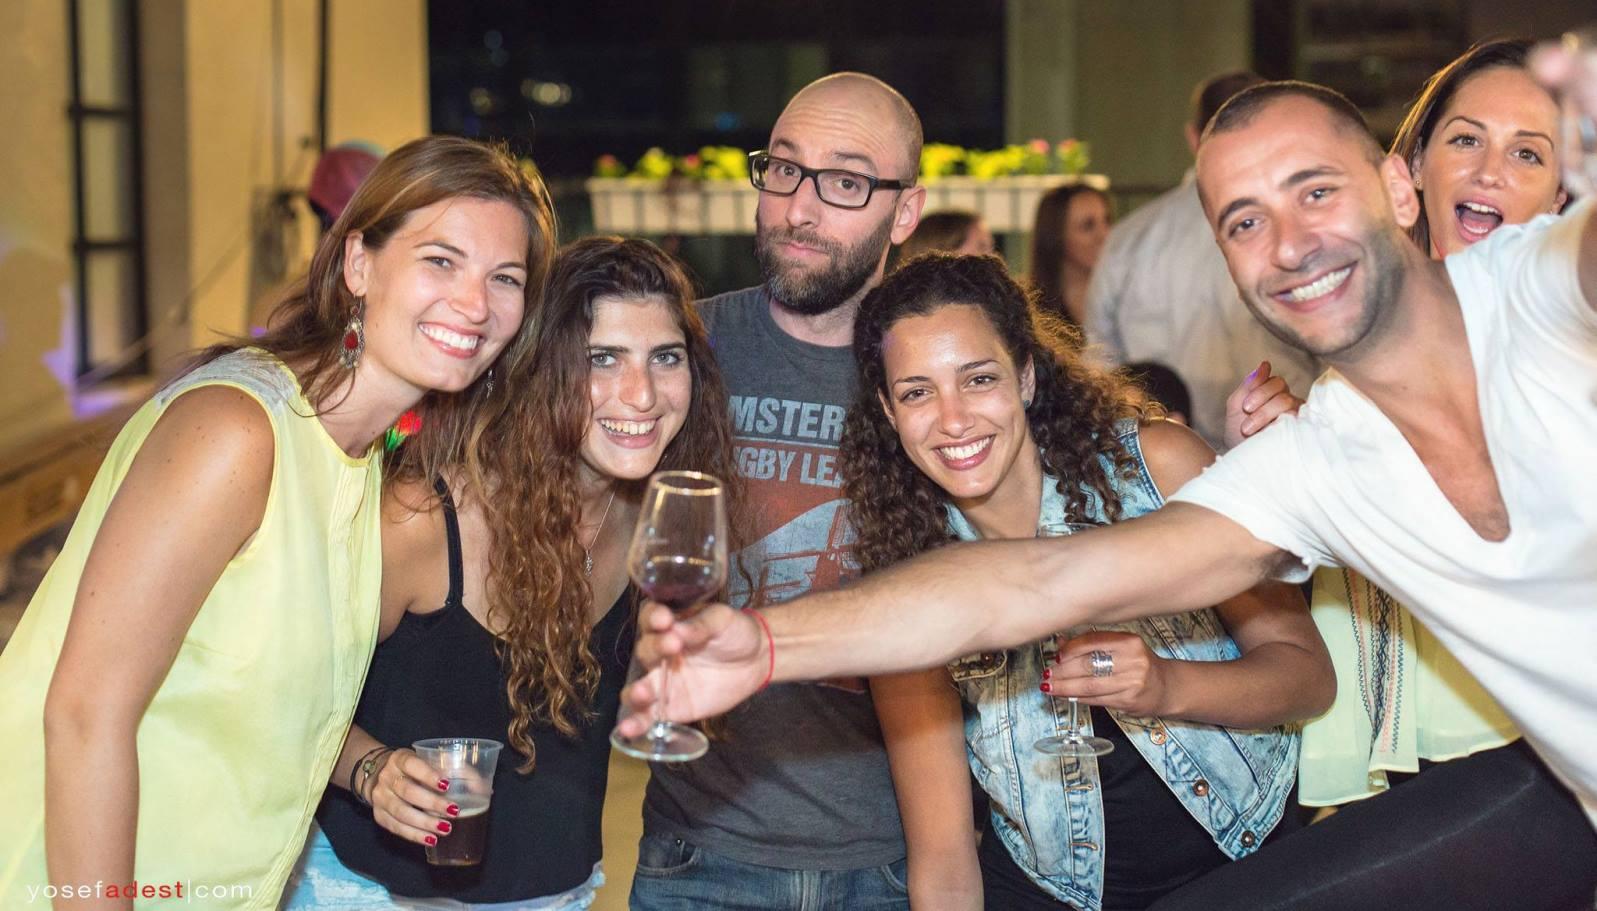 Wine Wednesday participants enjoying vino in Tel Aviv. Photo by Yosef Adest